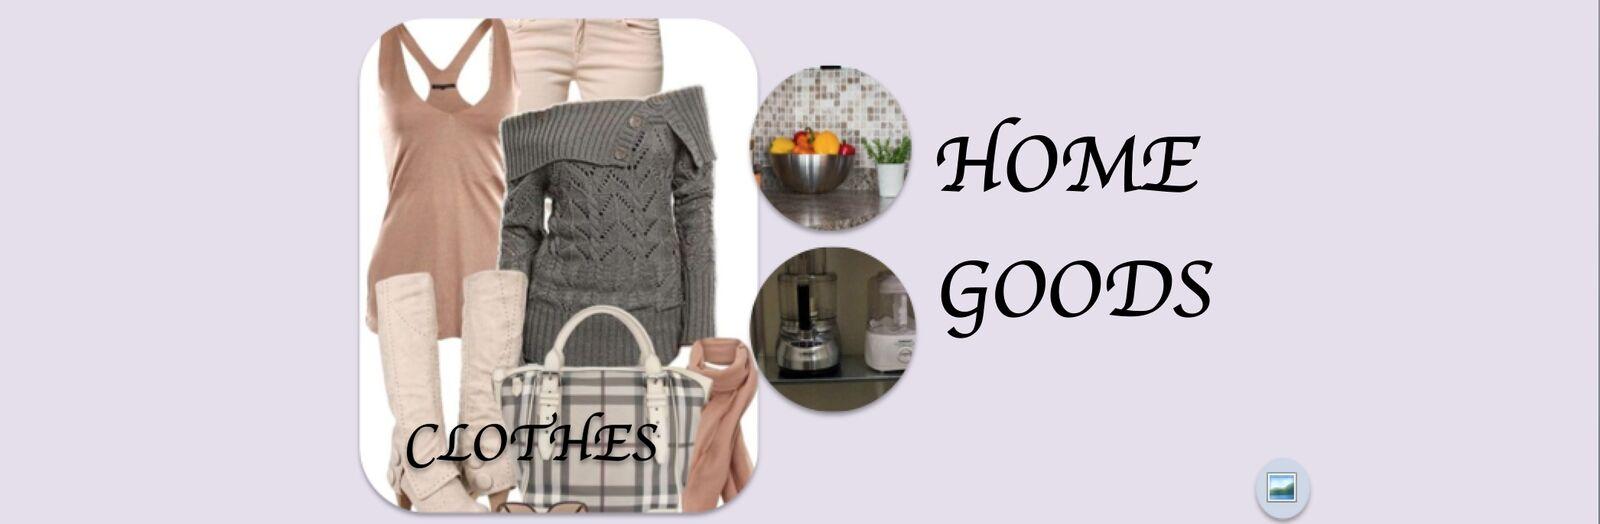 Tara s Clothes and Home Goods